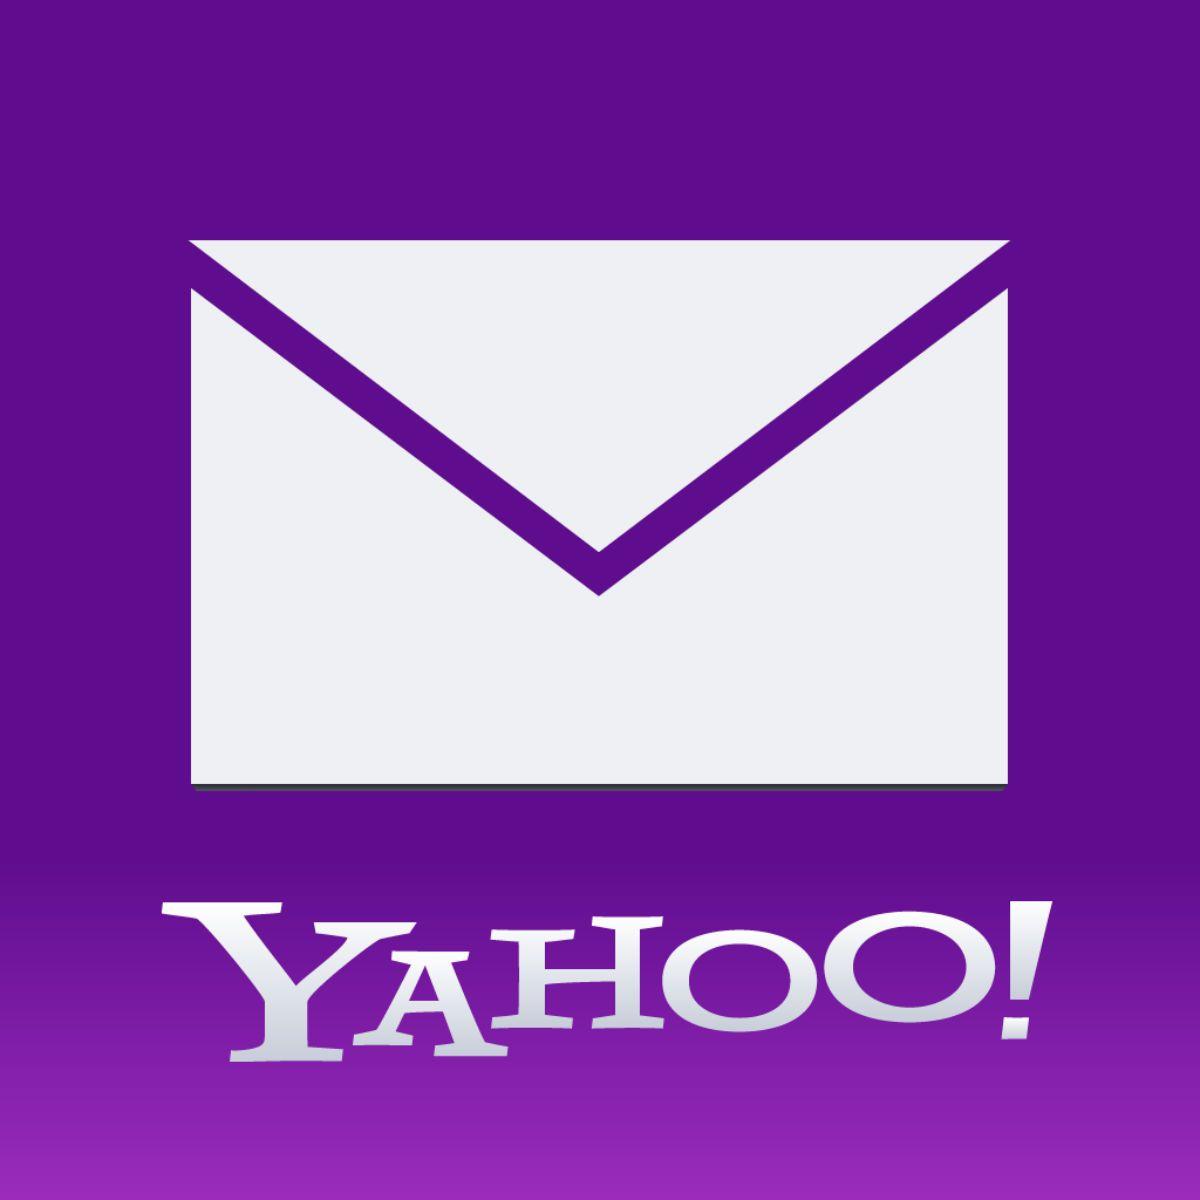 Image result for yahoo logo